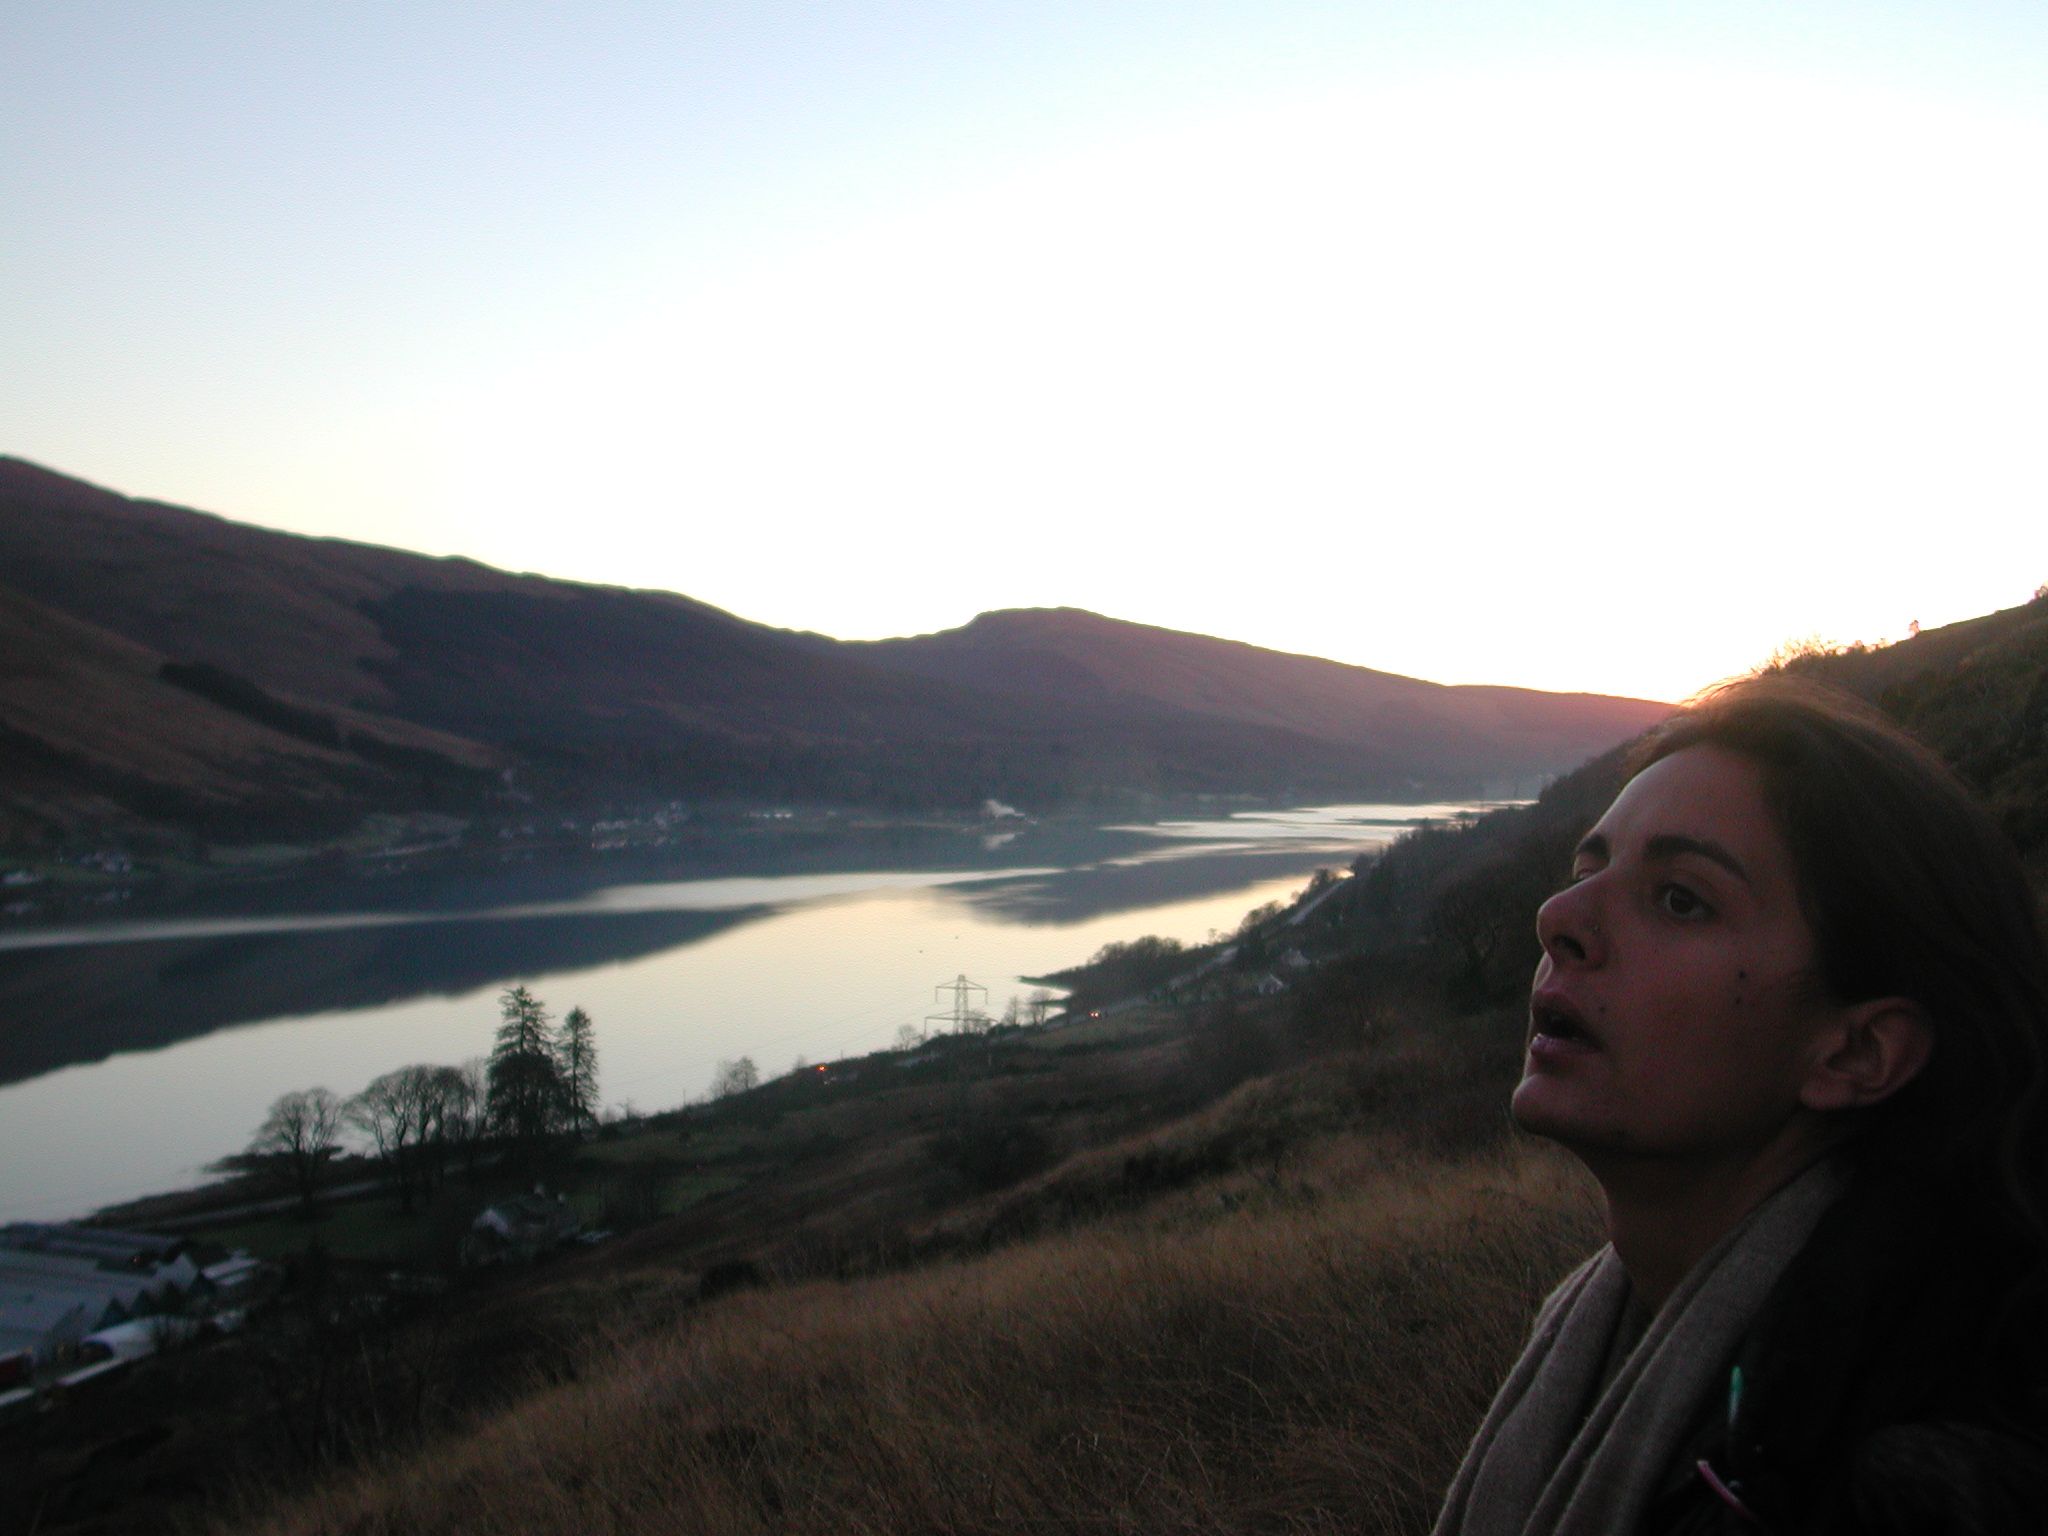 Tara Singh, Loch Fyne